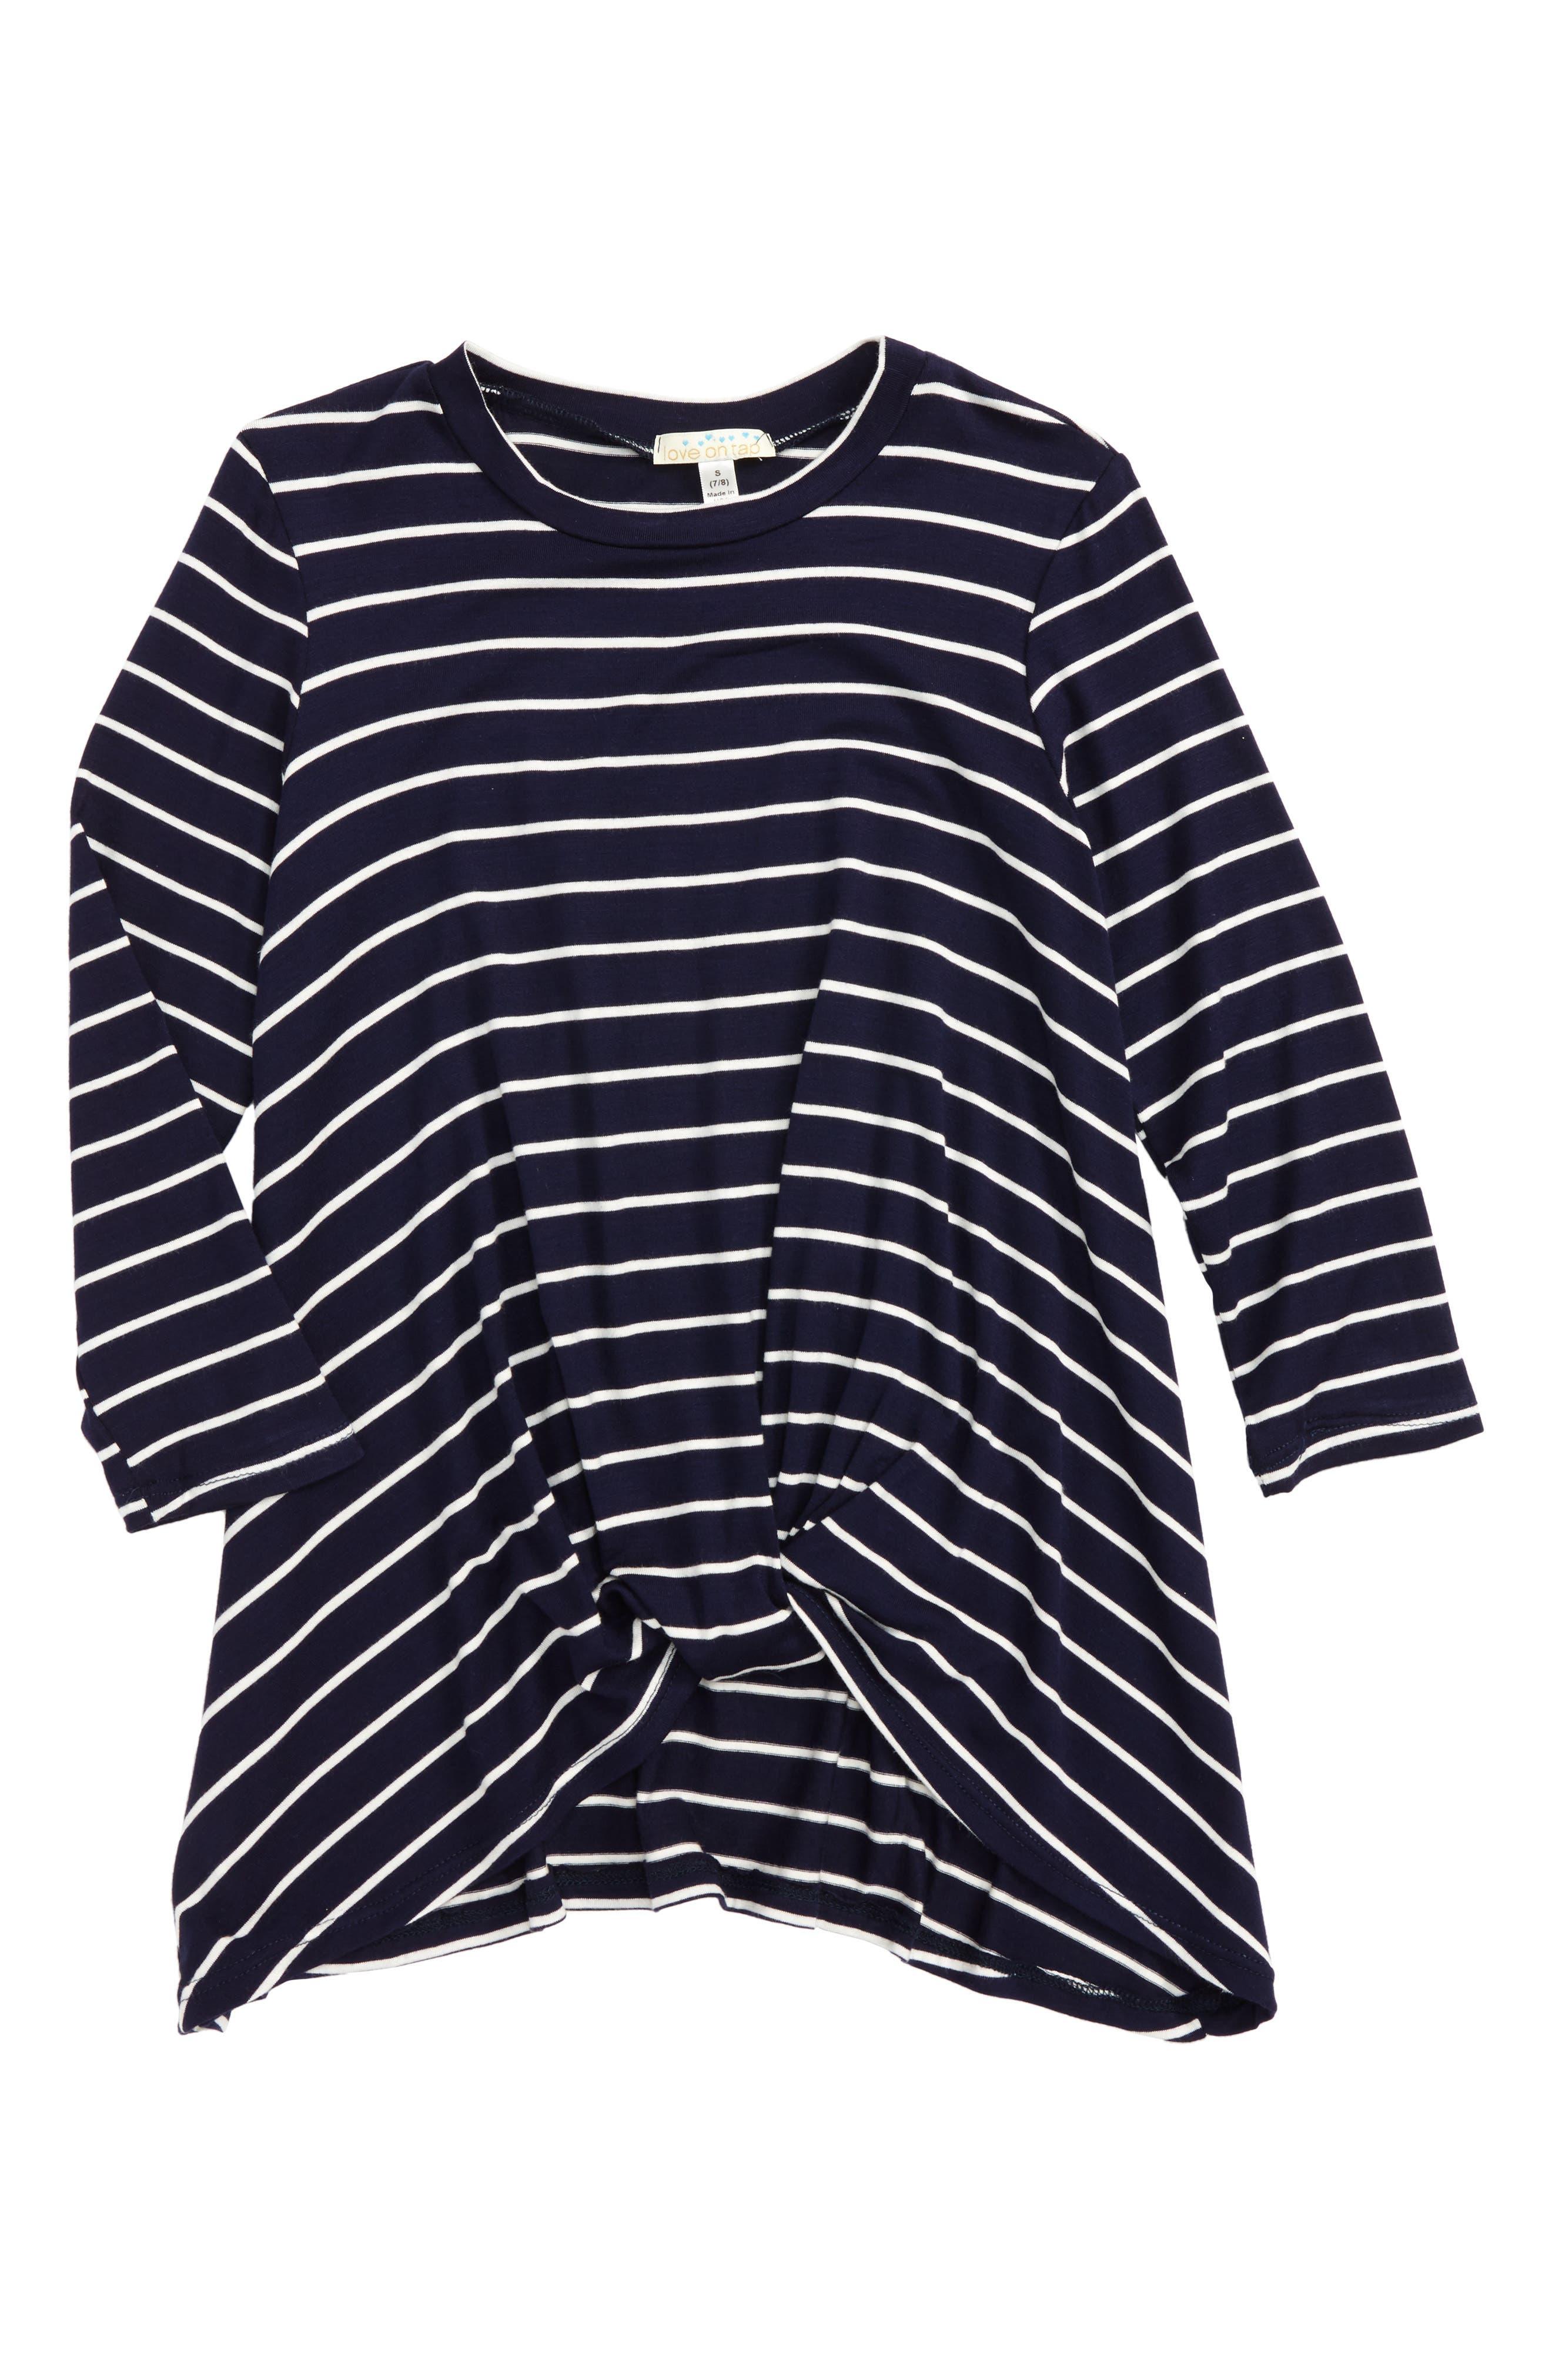 Stripe Tee,                         Main,                         color, Navy/ White